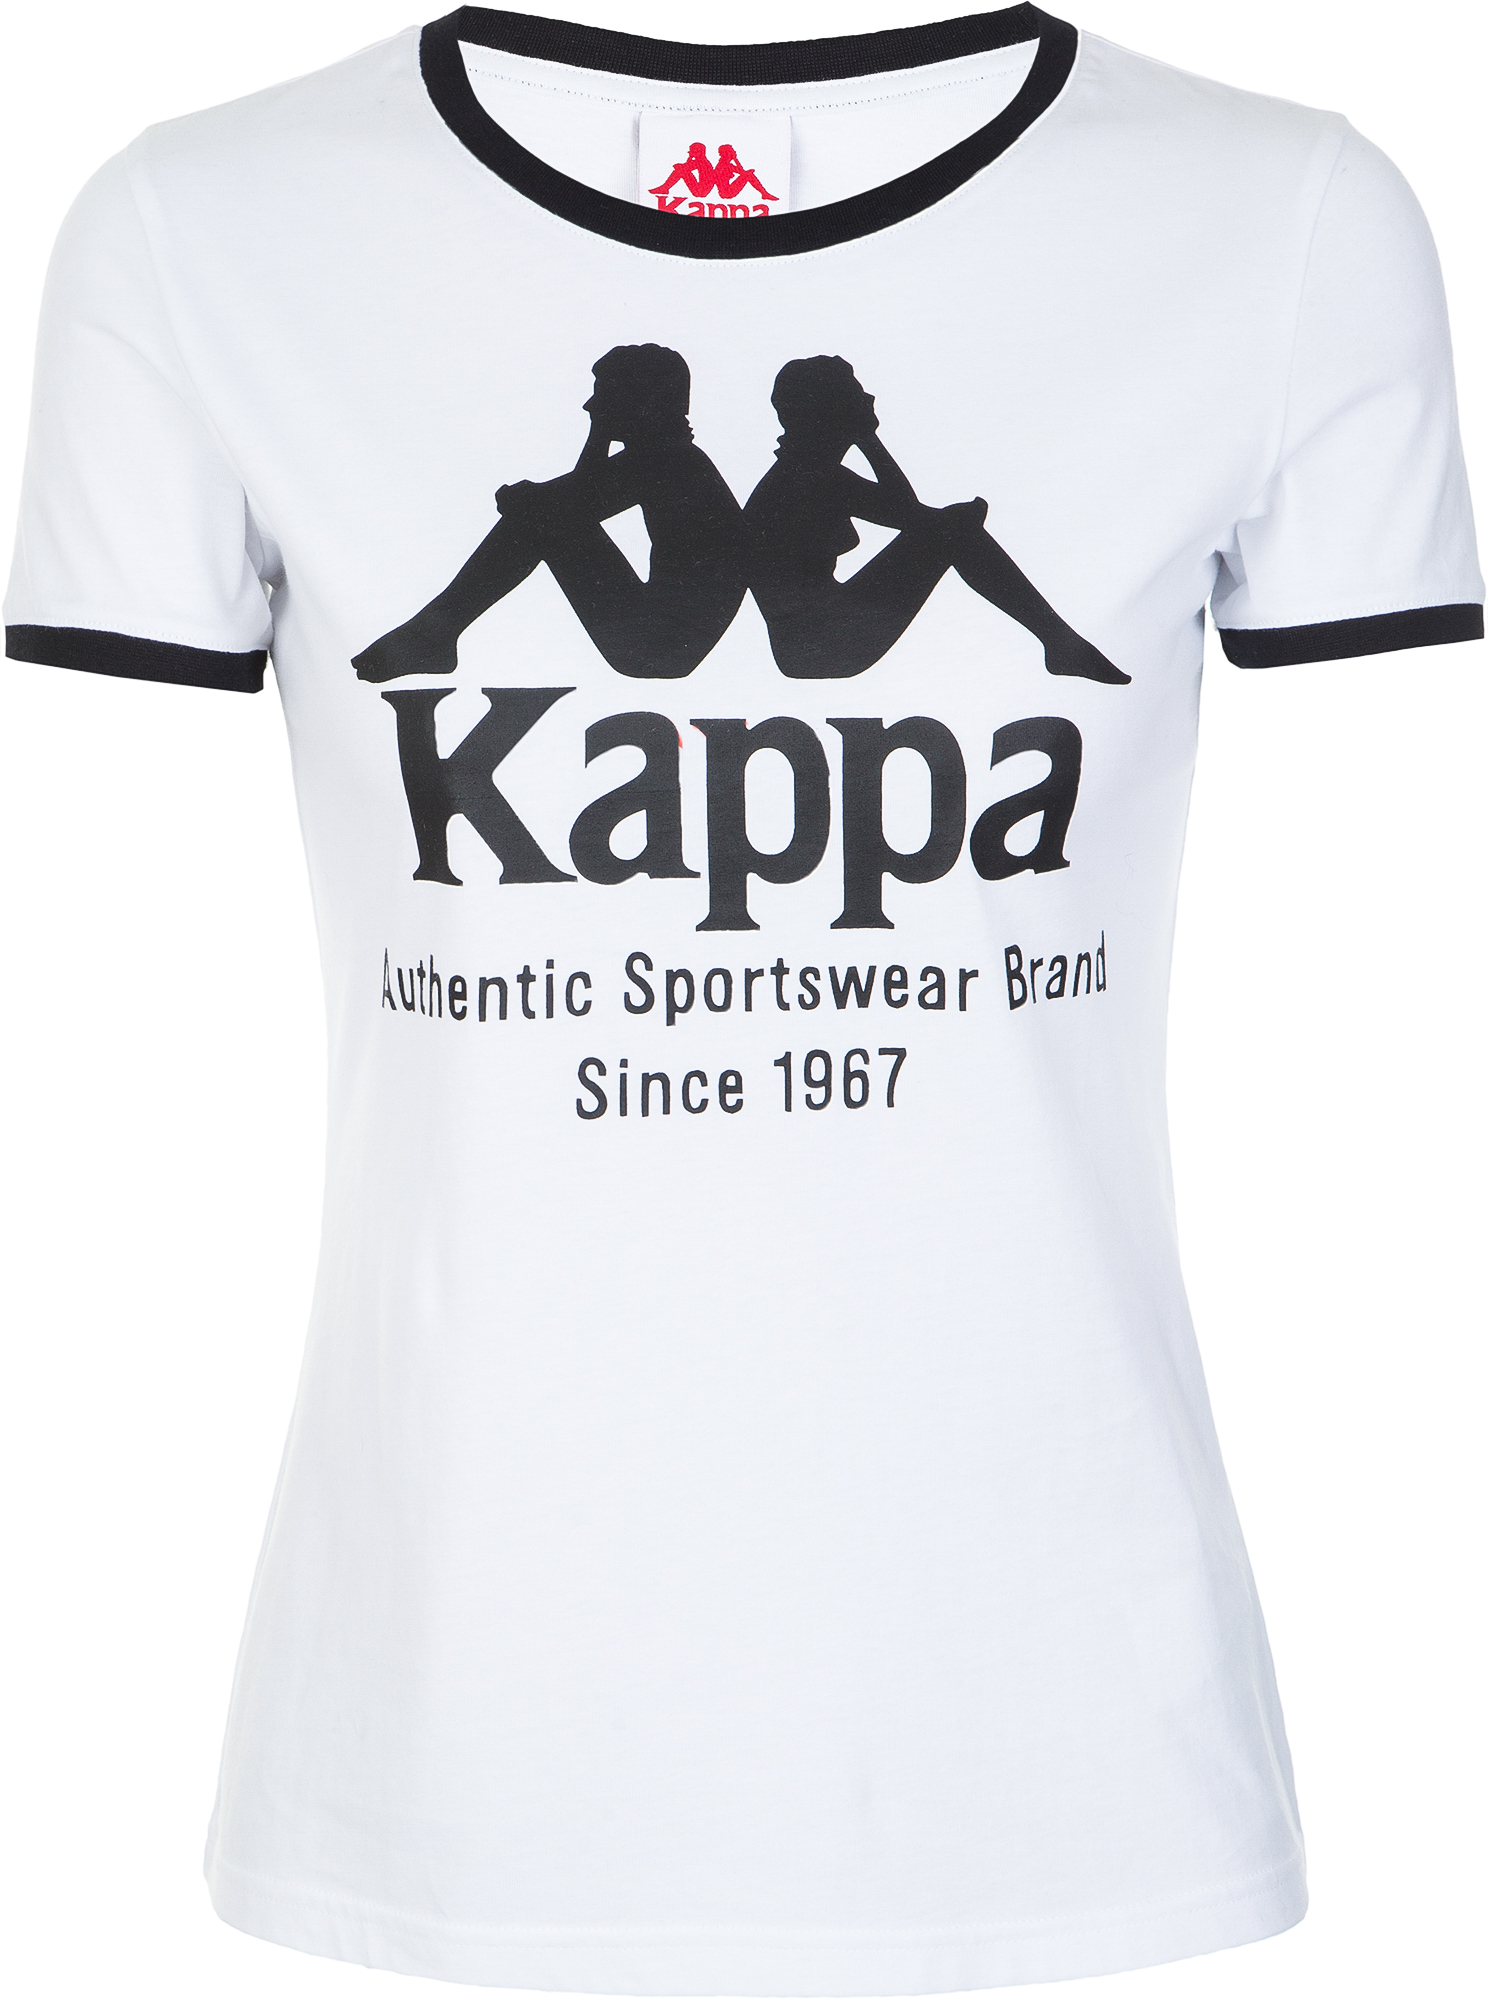 цены Kappa Футболка женская Kappa, размер 46